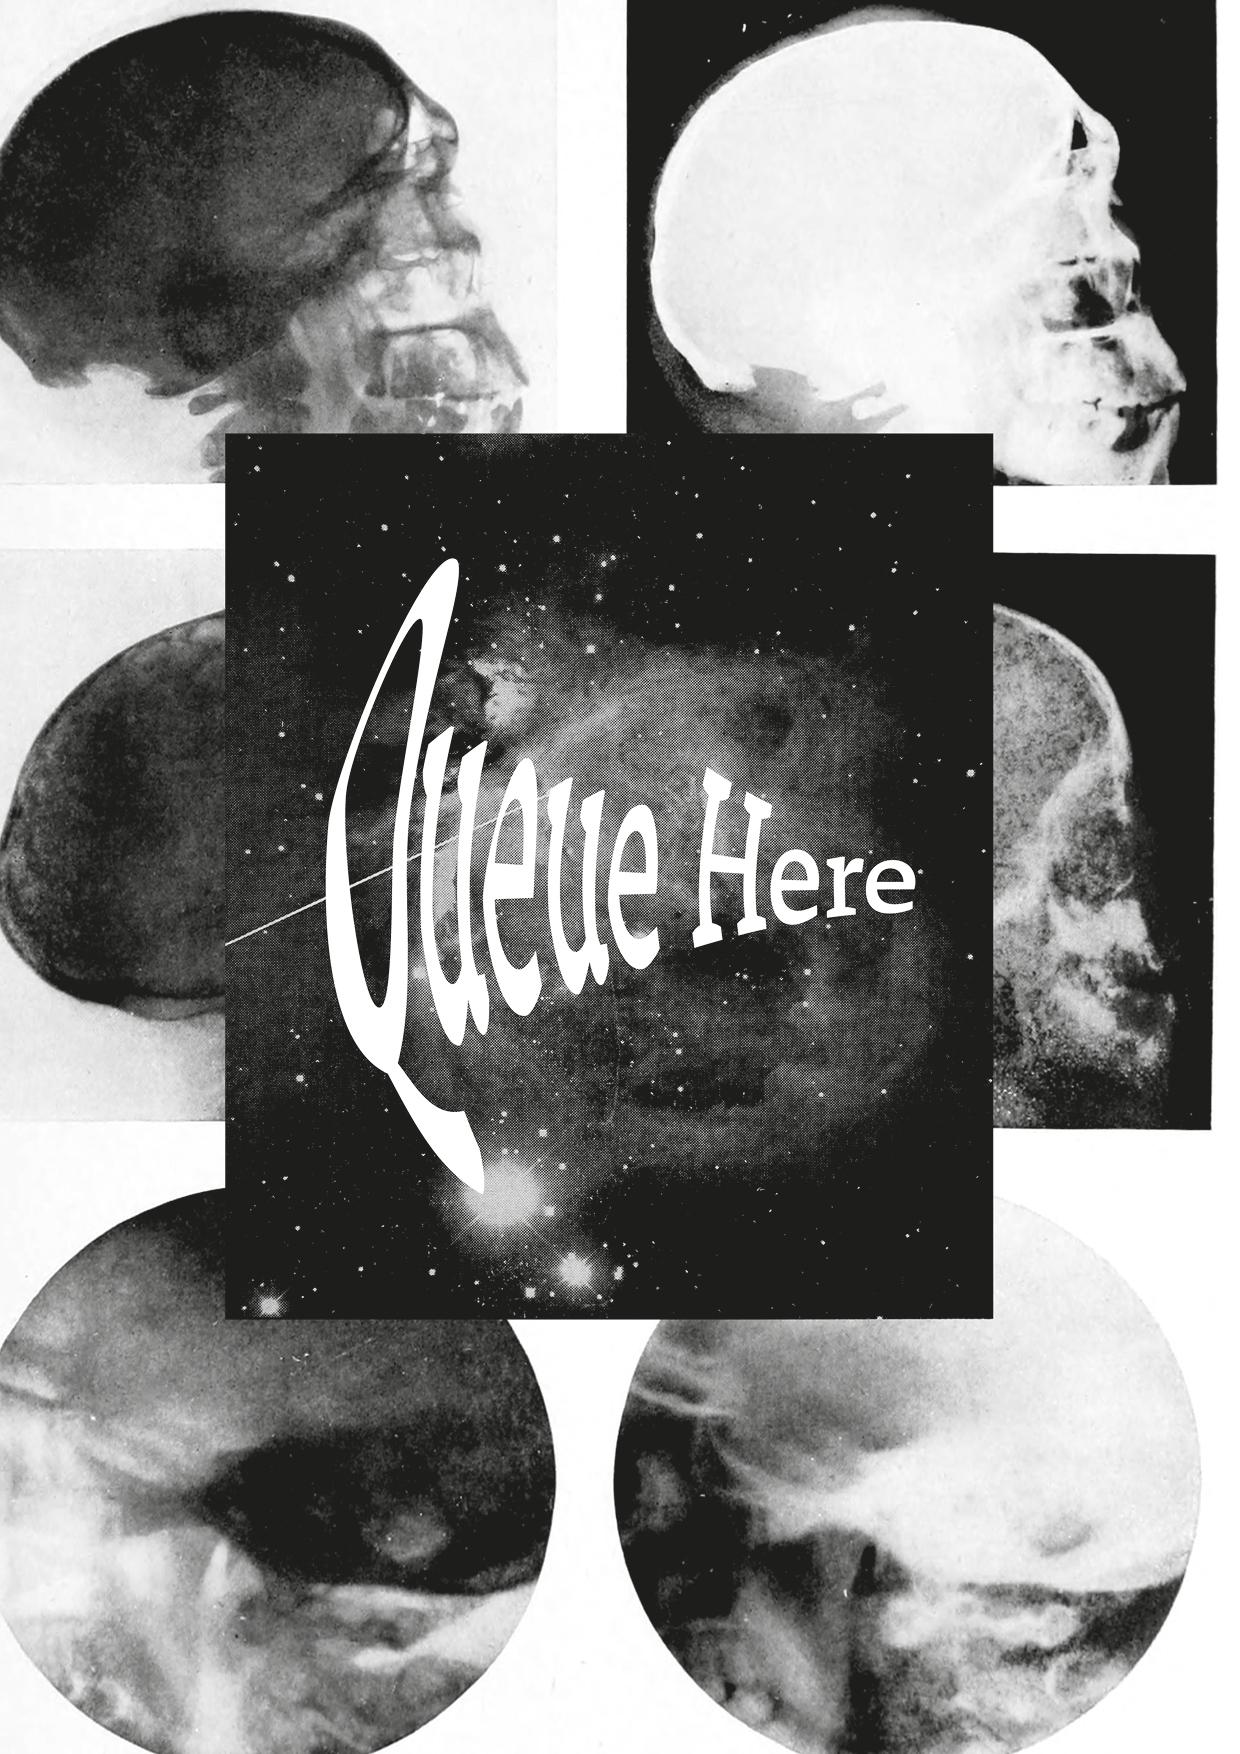 Unsubscribe-print-typography-design-James-Lee-Duffy22.jpg